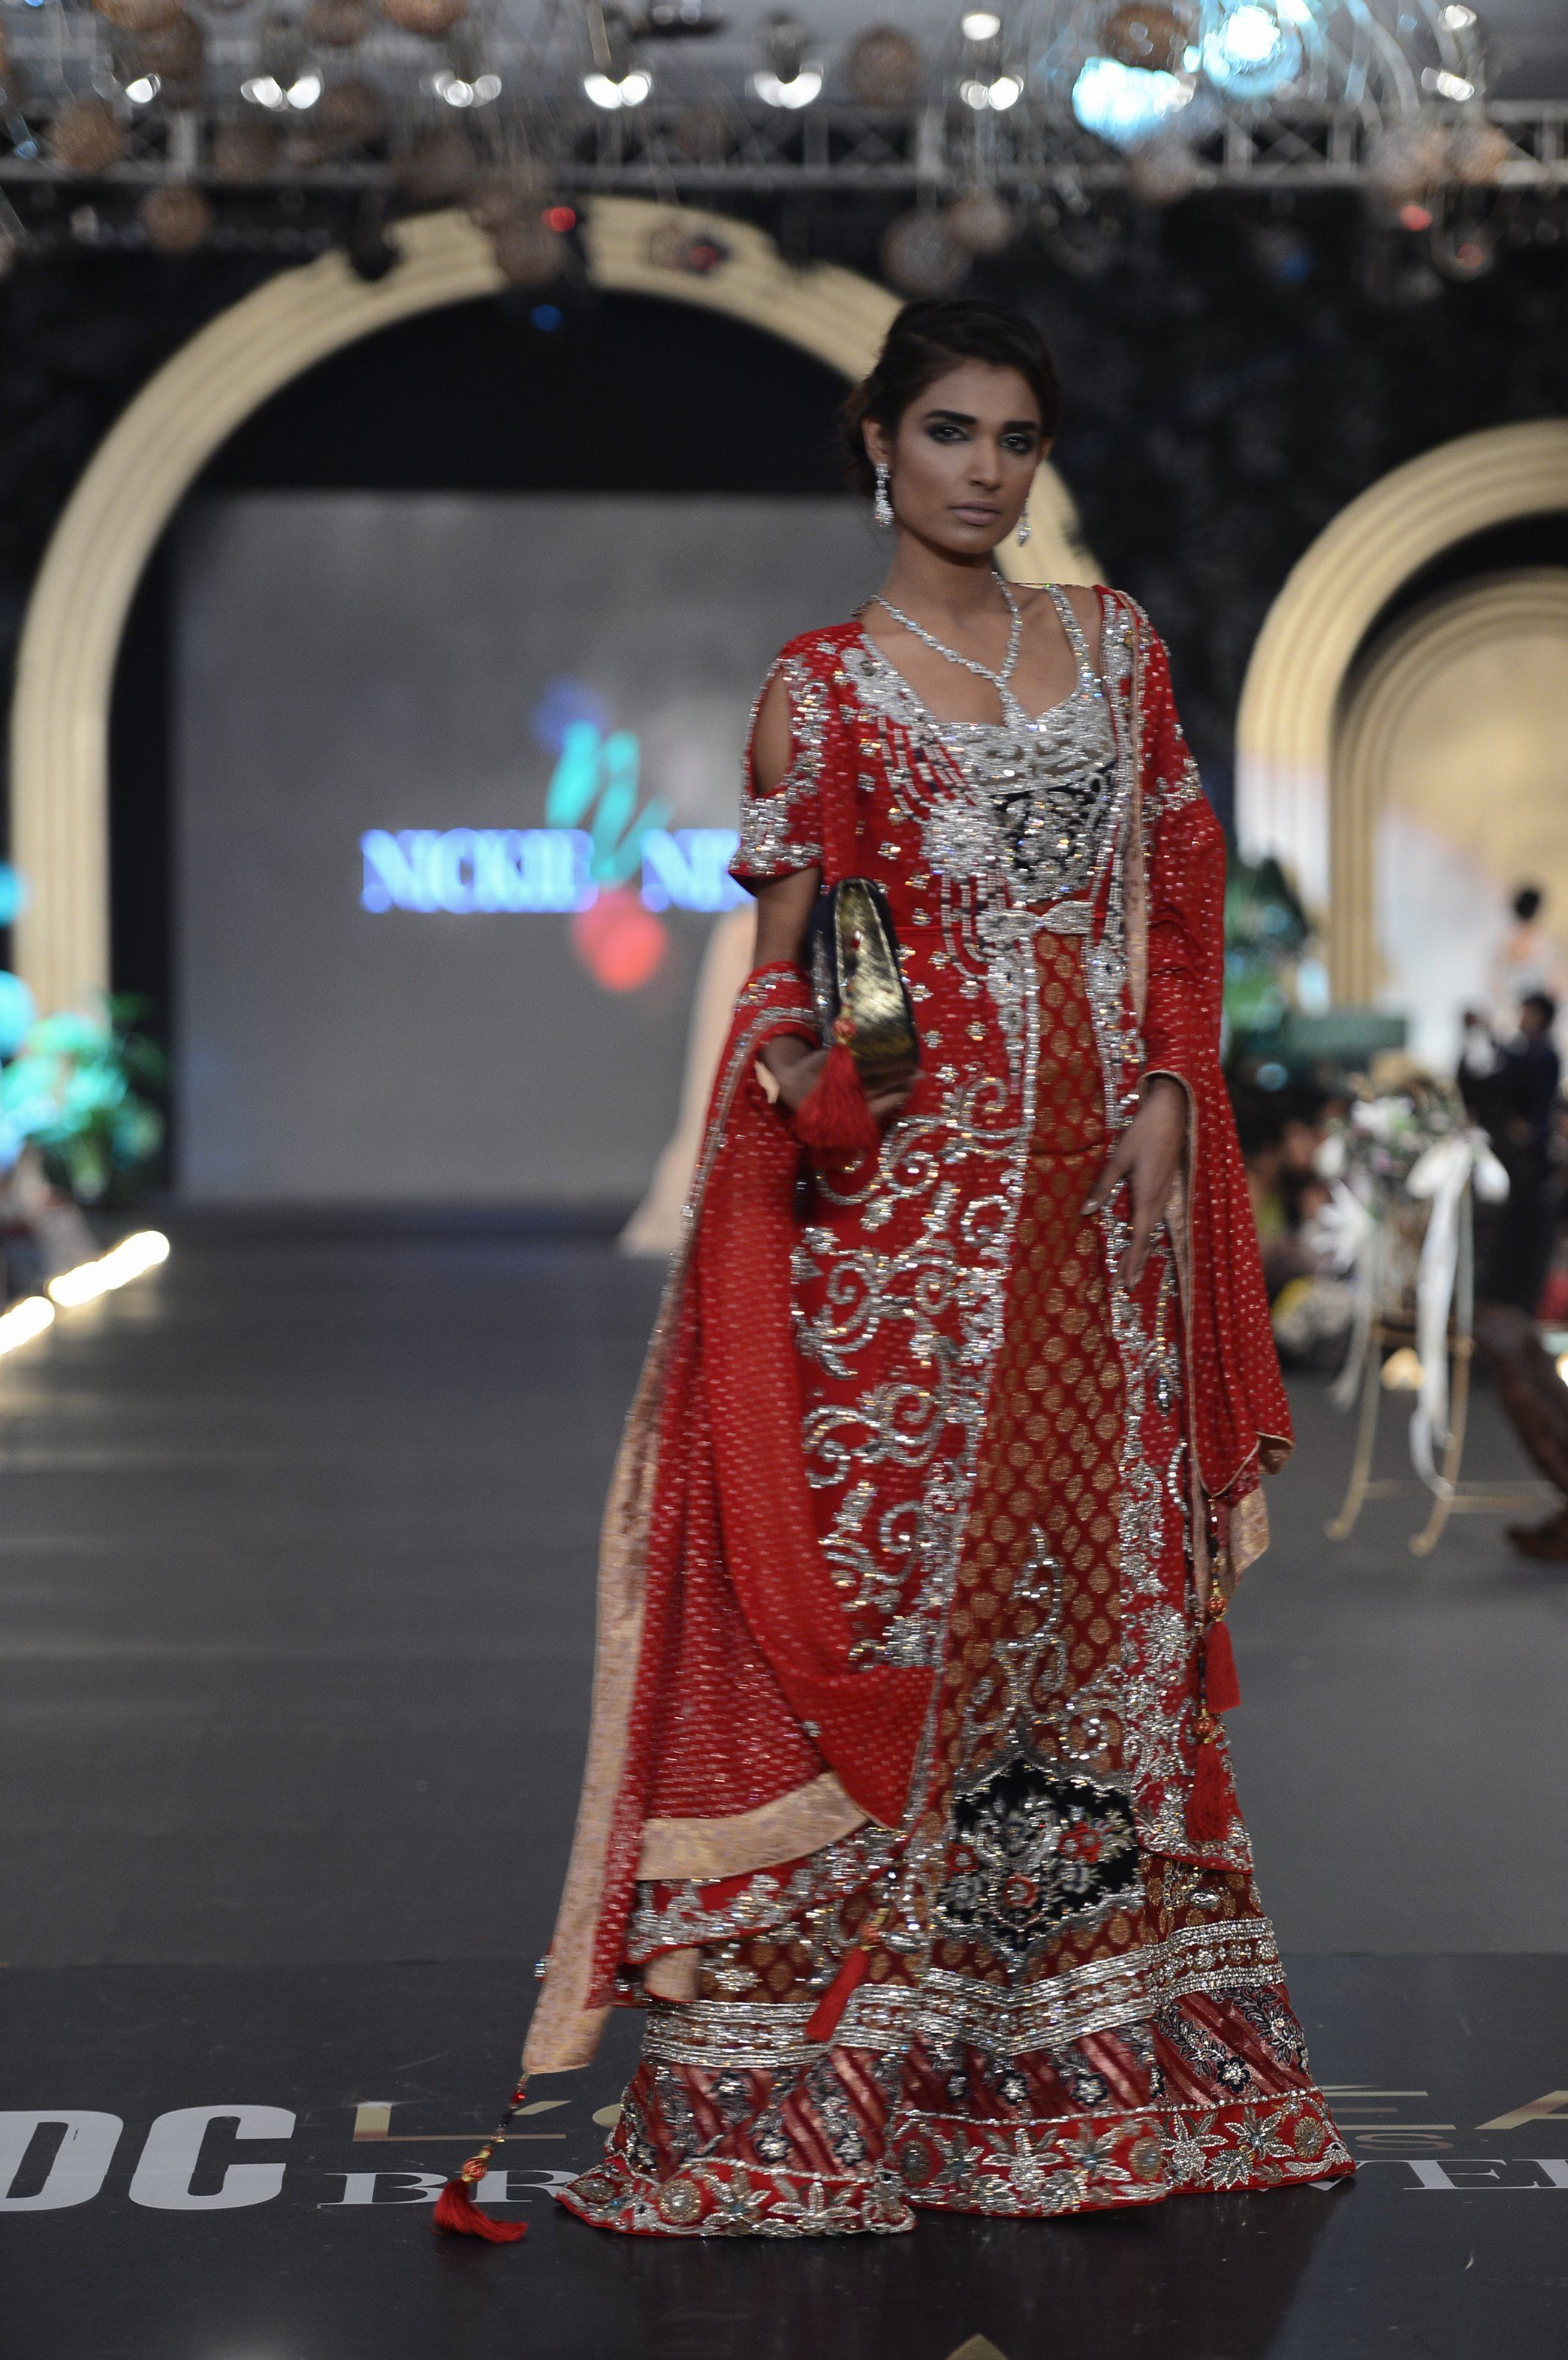 Nickienina Dresses Dress Partydresses Http Www Fashioncentral Pk Pakistani Designers 22 Nickie Nina Fashion Bridal Fashion Week Asian Fashion